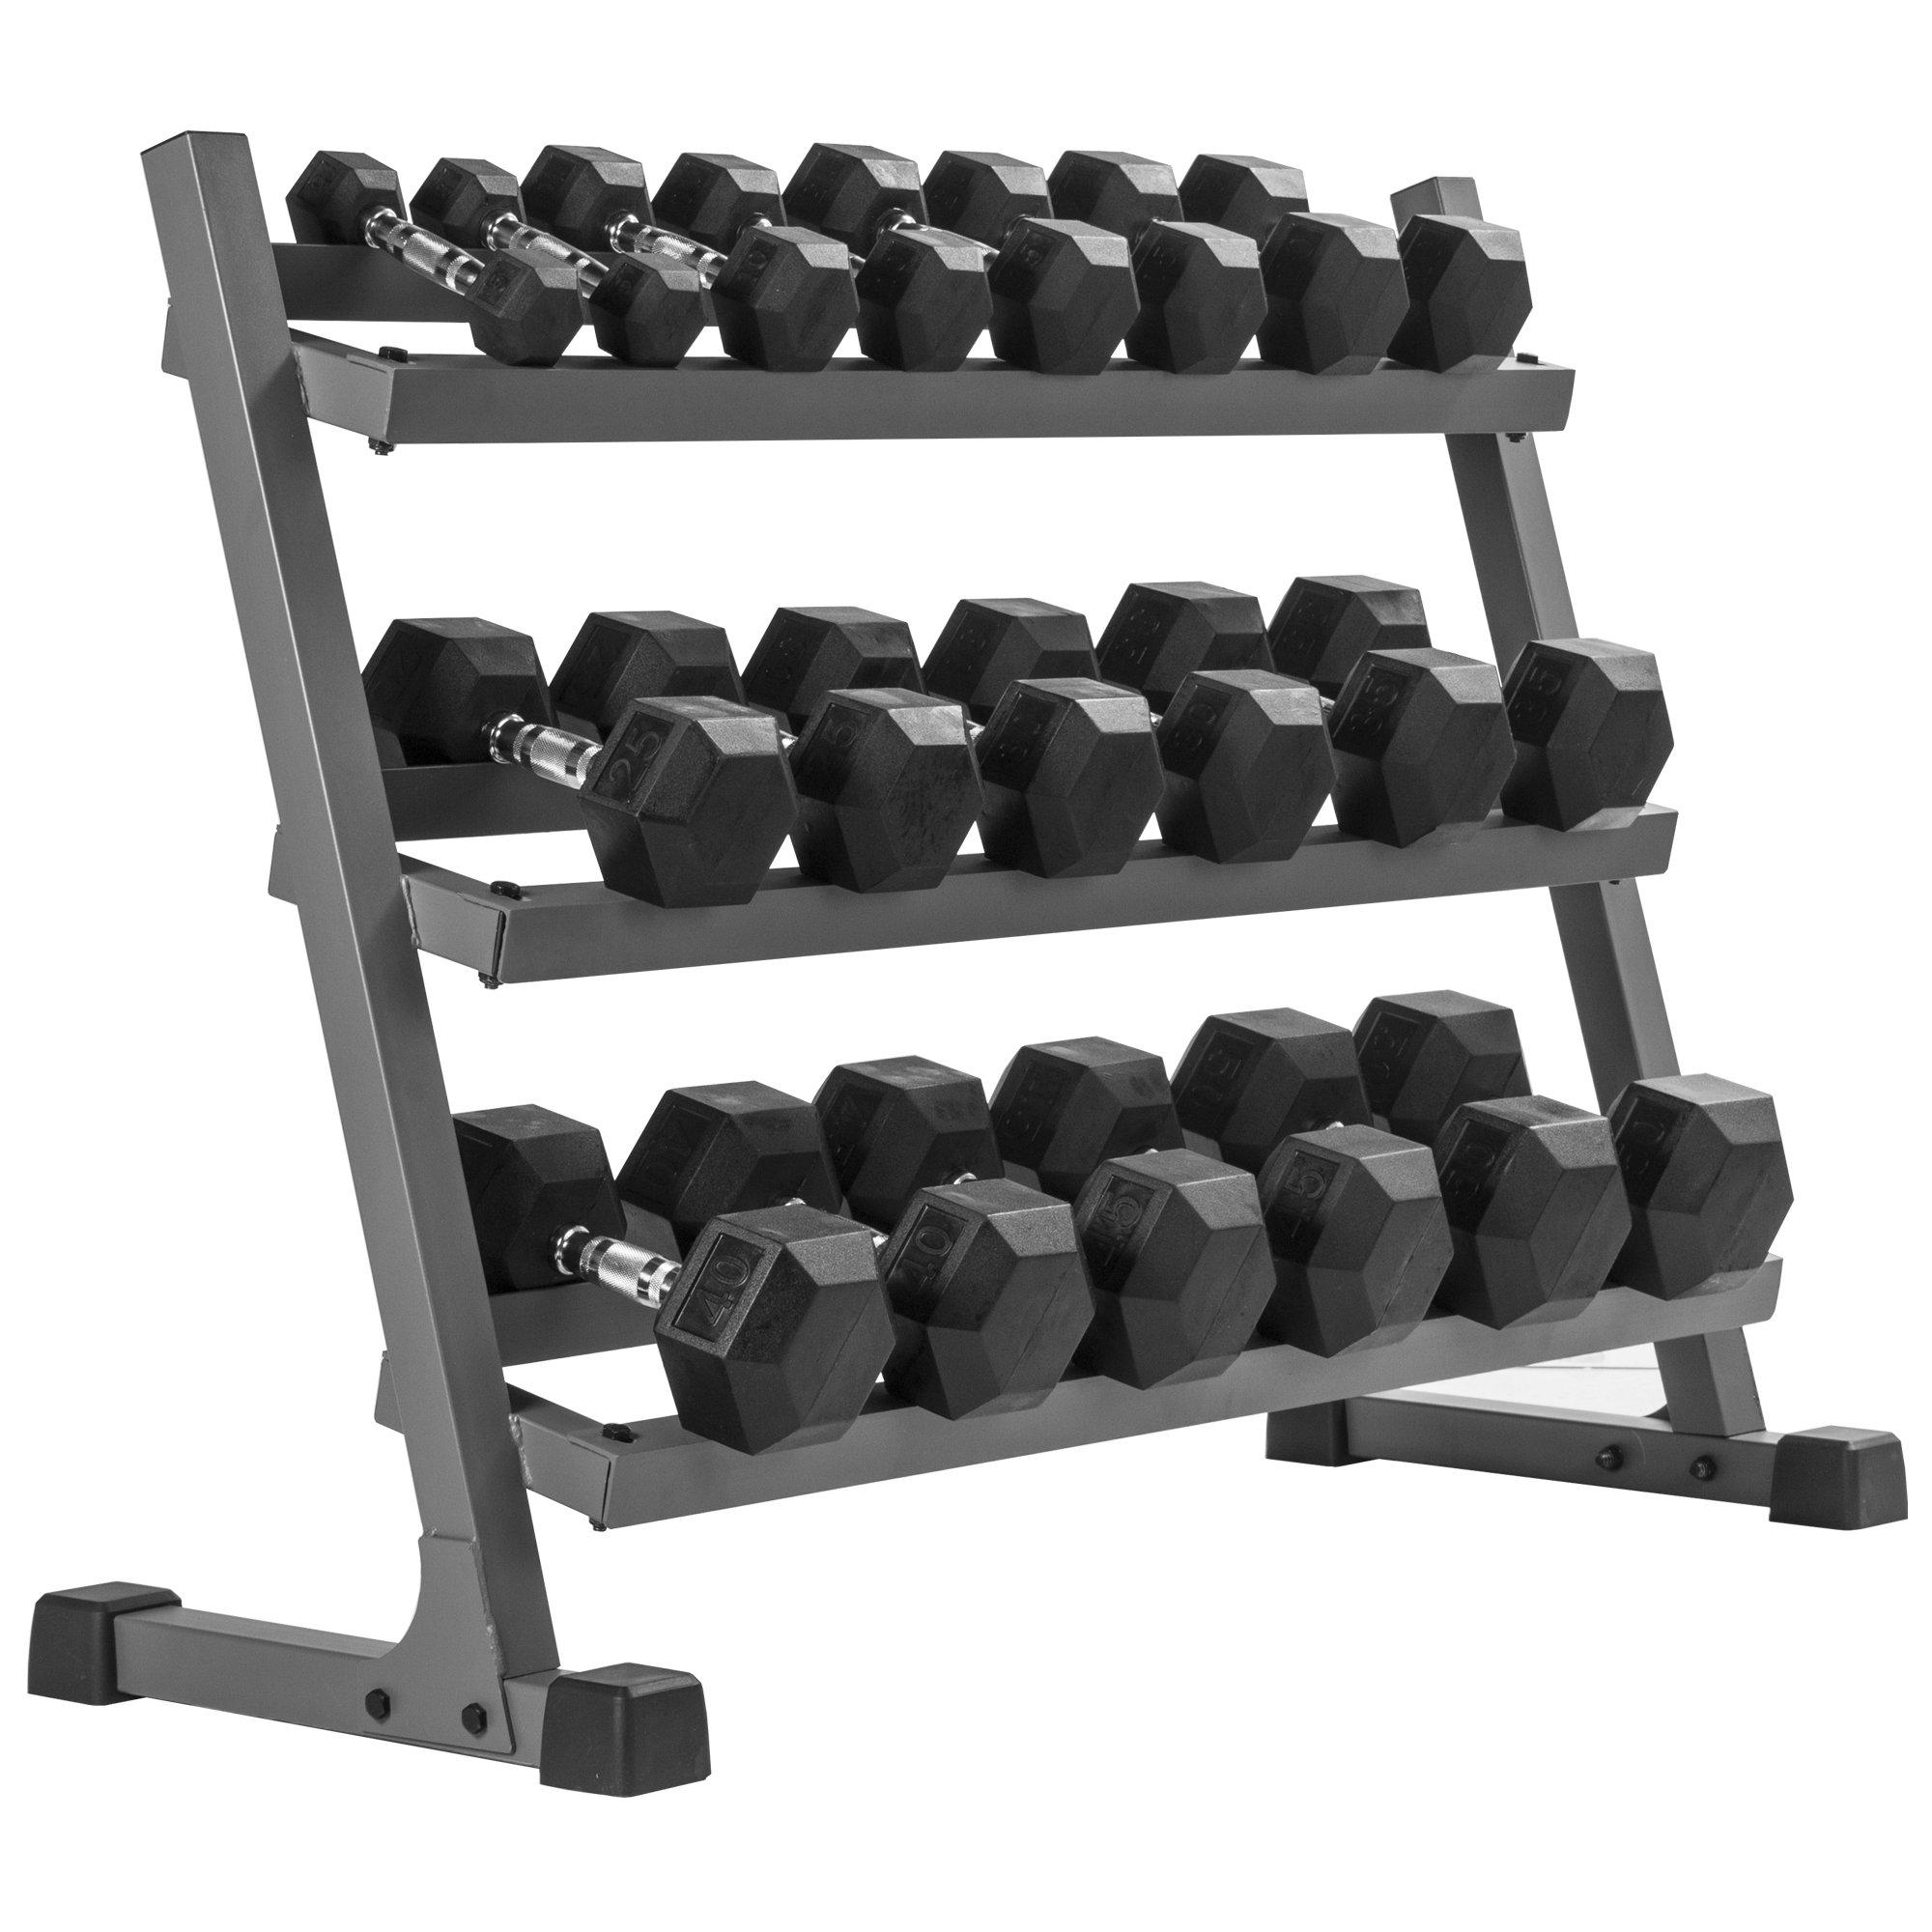 XMark's 550 lb. Premium Hex Dumbbell Set (10 Pair: 5 lb to 50 lb Pairs) with XMark's Heavy Duty Three Tier Dumbbell Rack (Gray Rack)